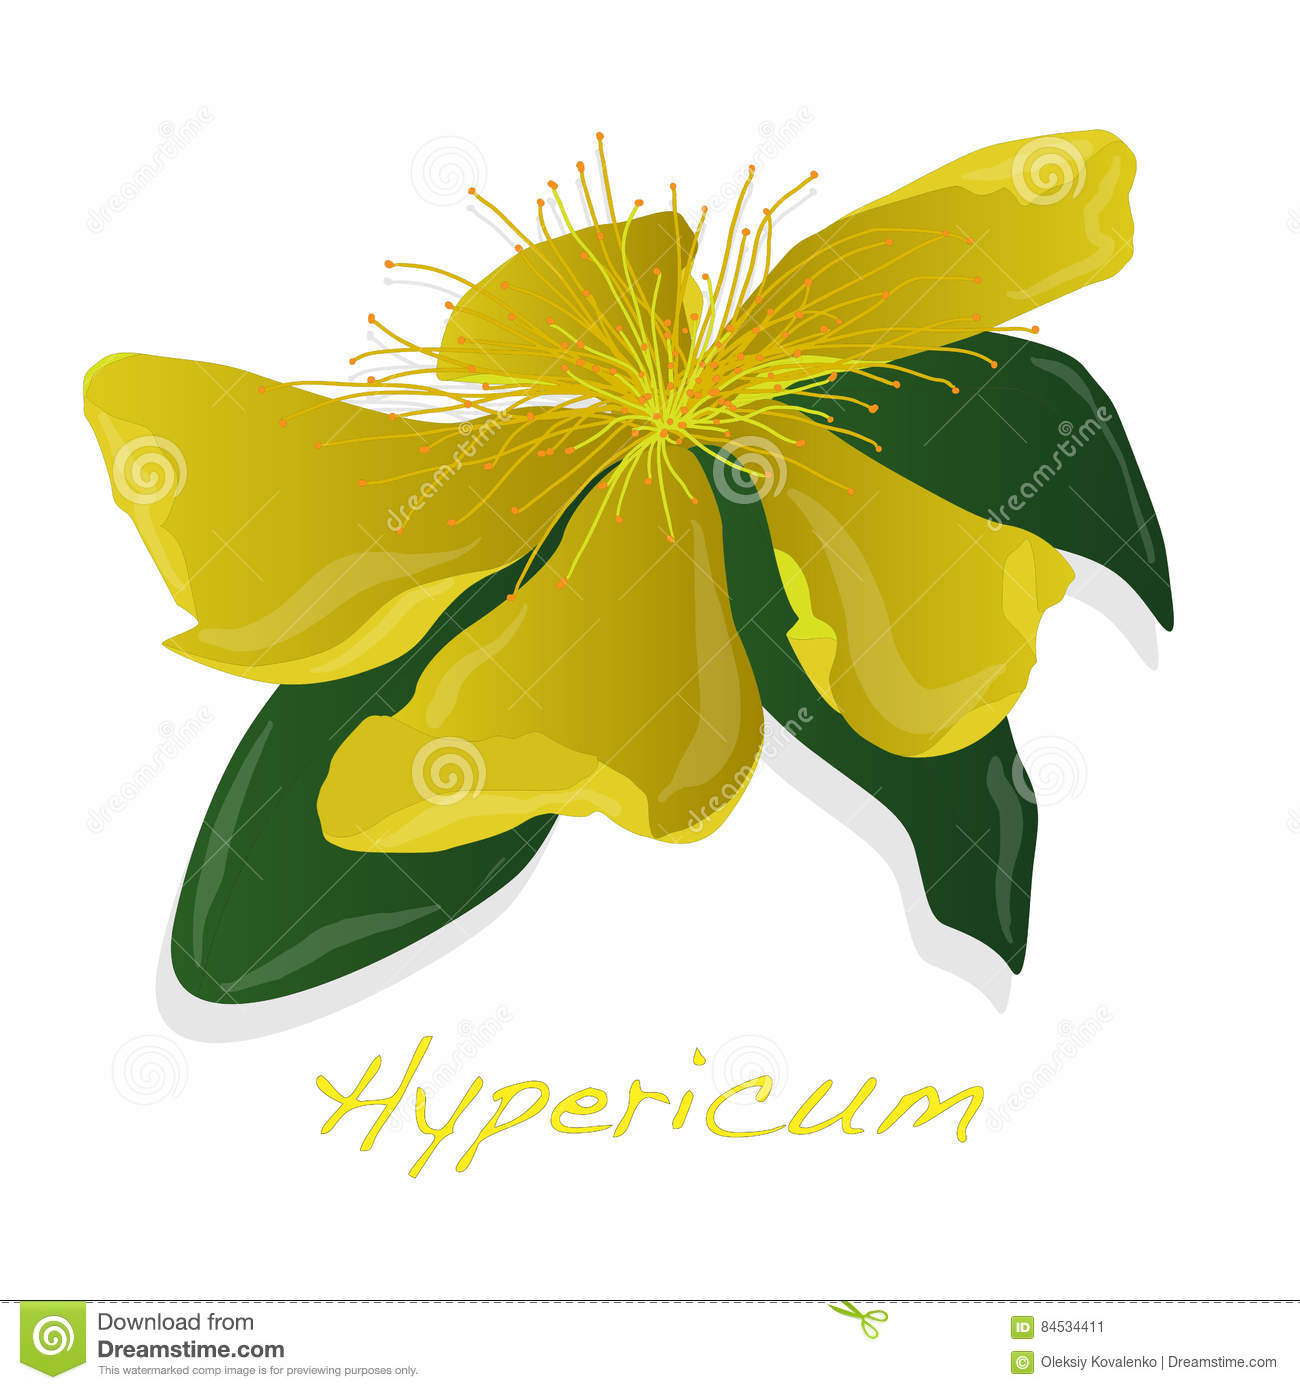 Hypericum Flower Stock Vector.